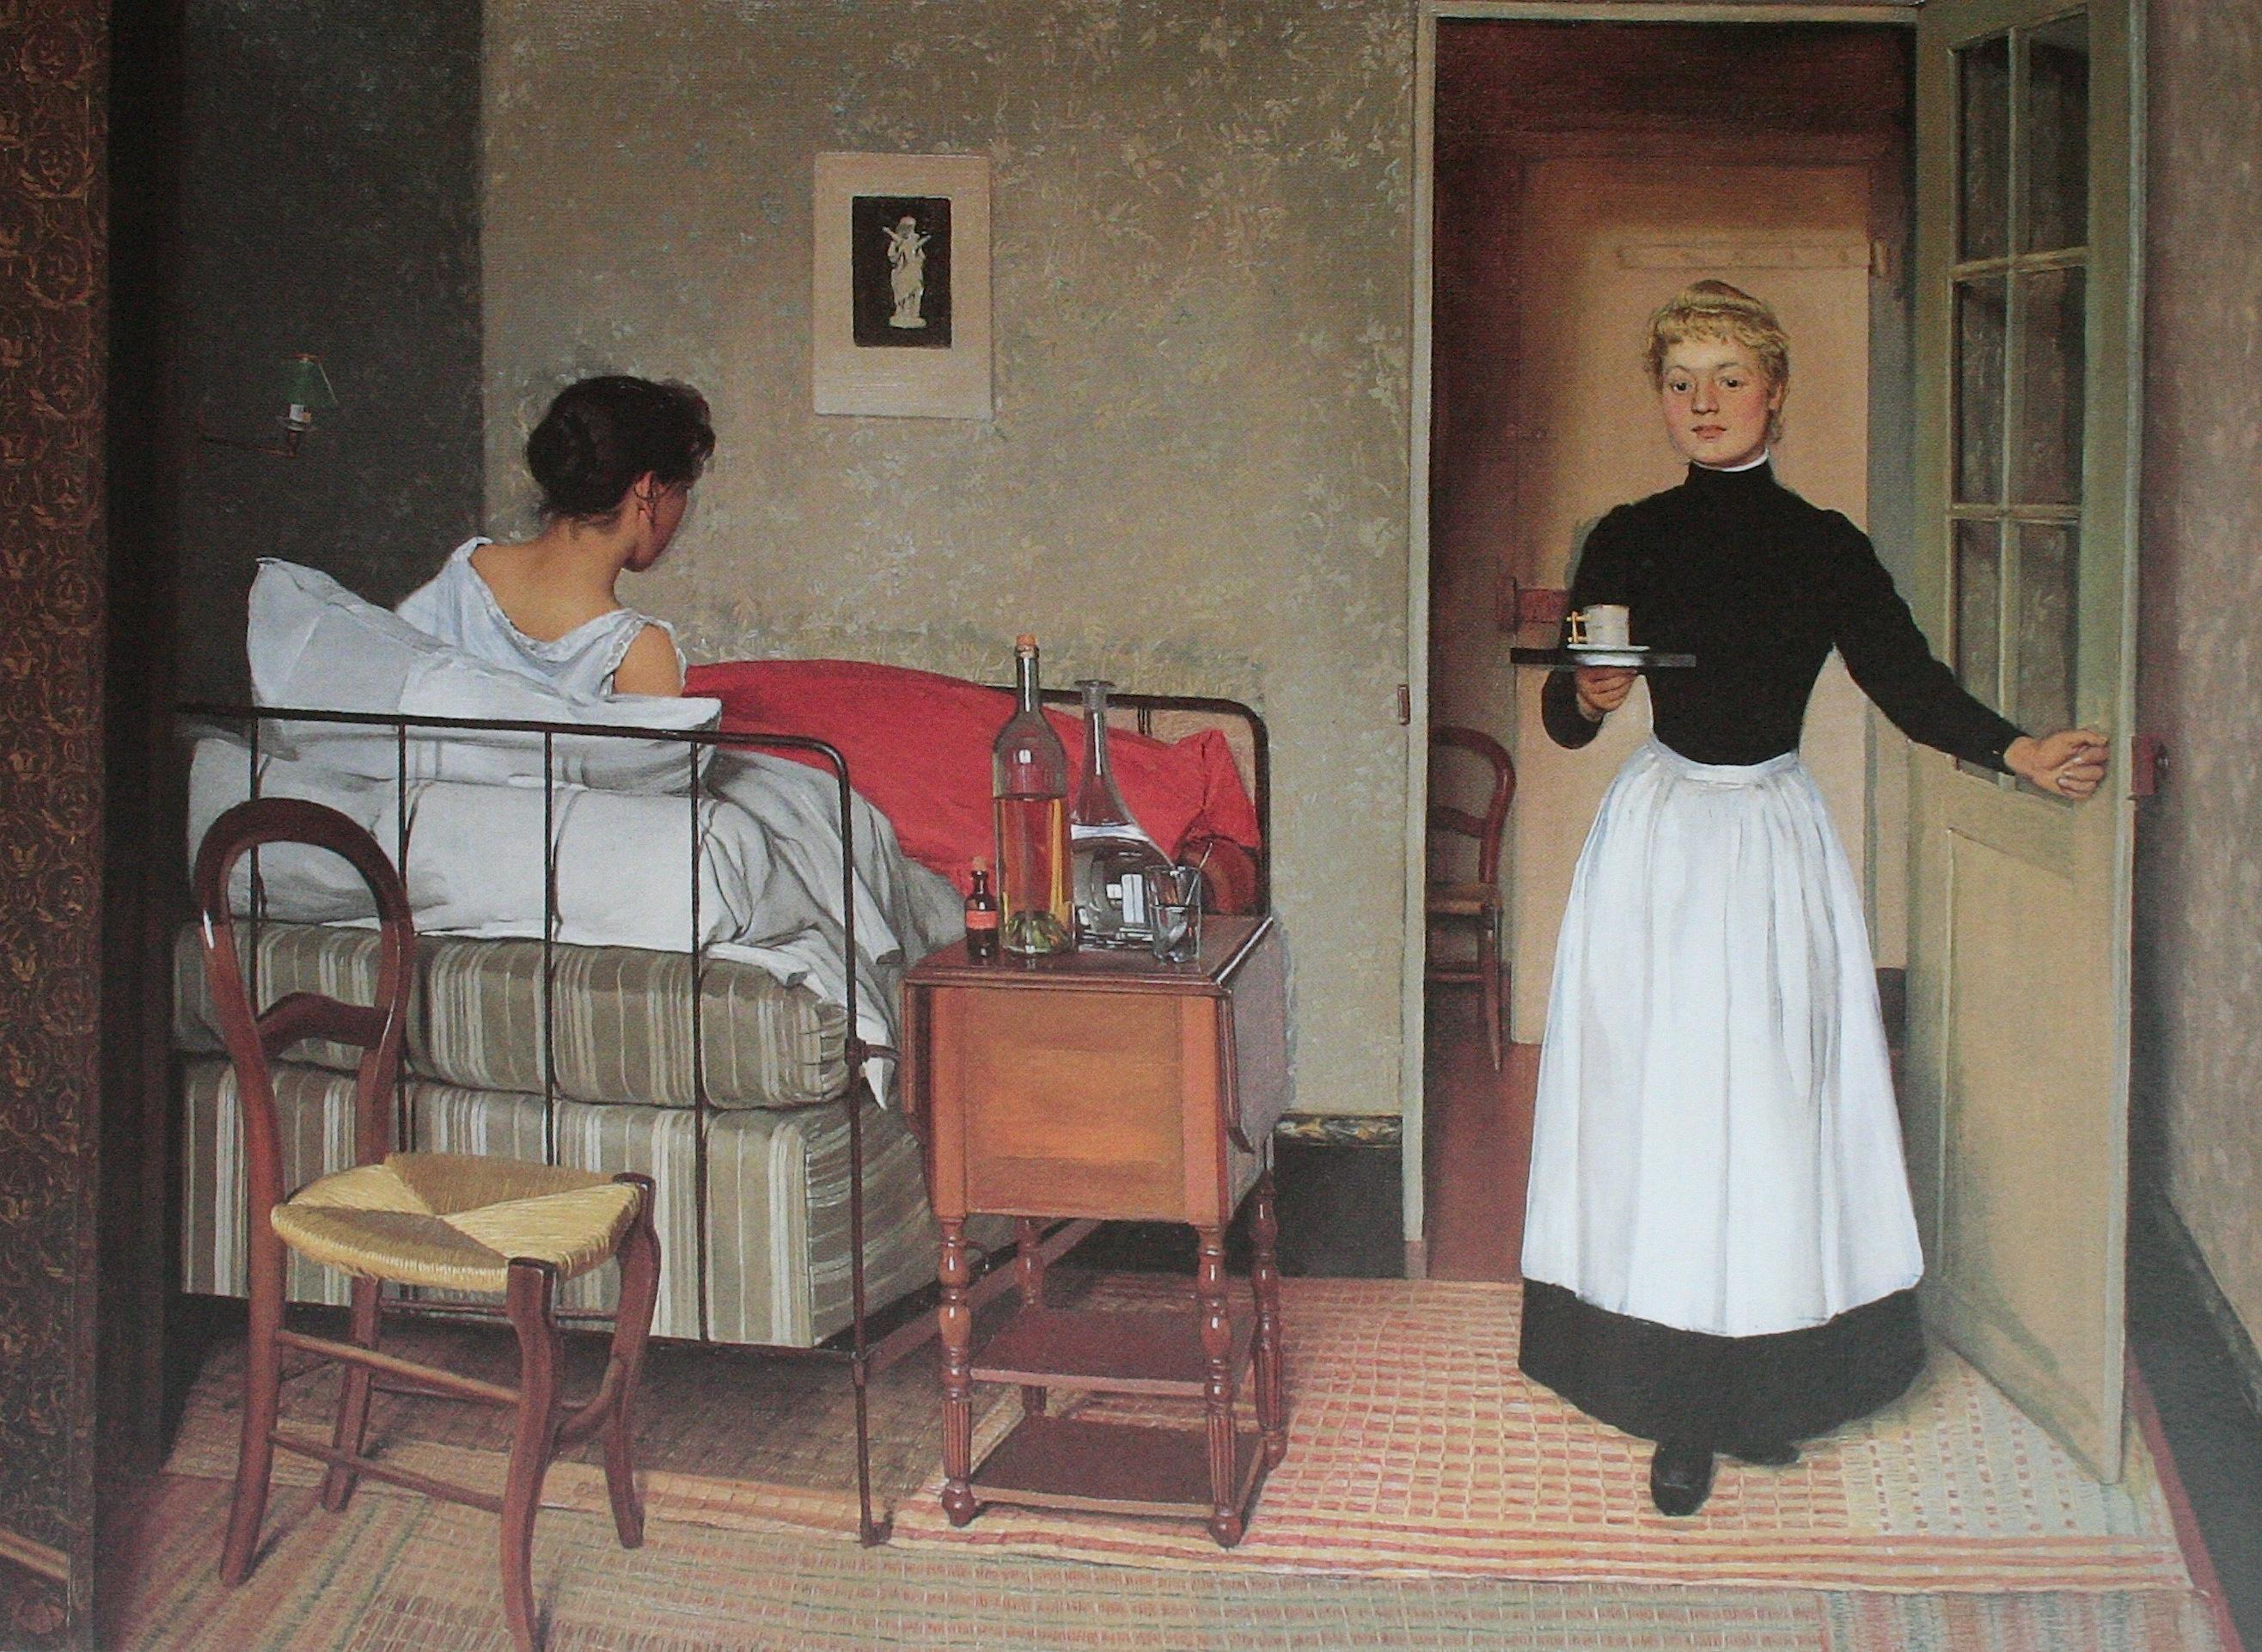 Datei:Vallotton Die Kranke 1892.jpg – Wikipedia